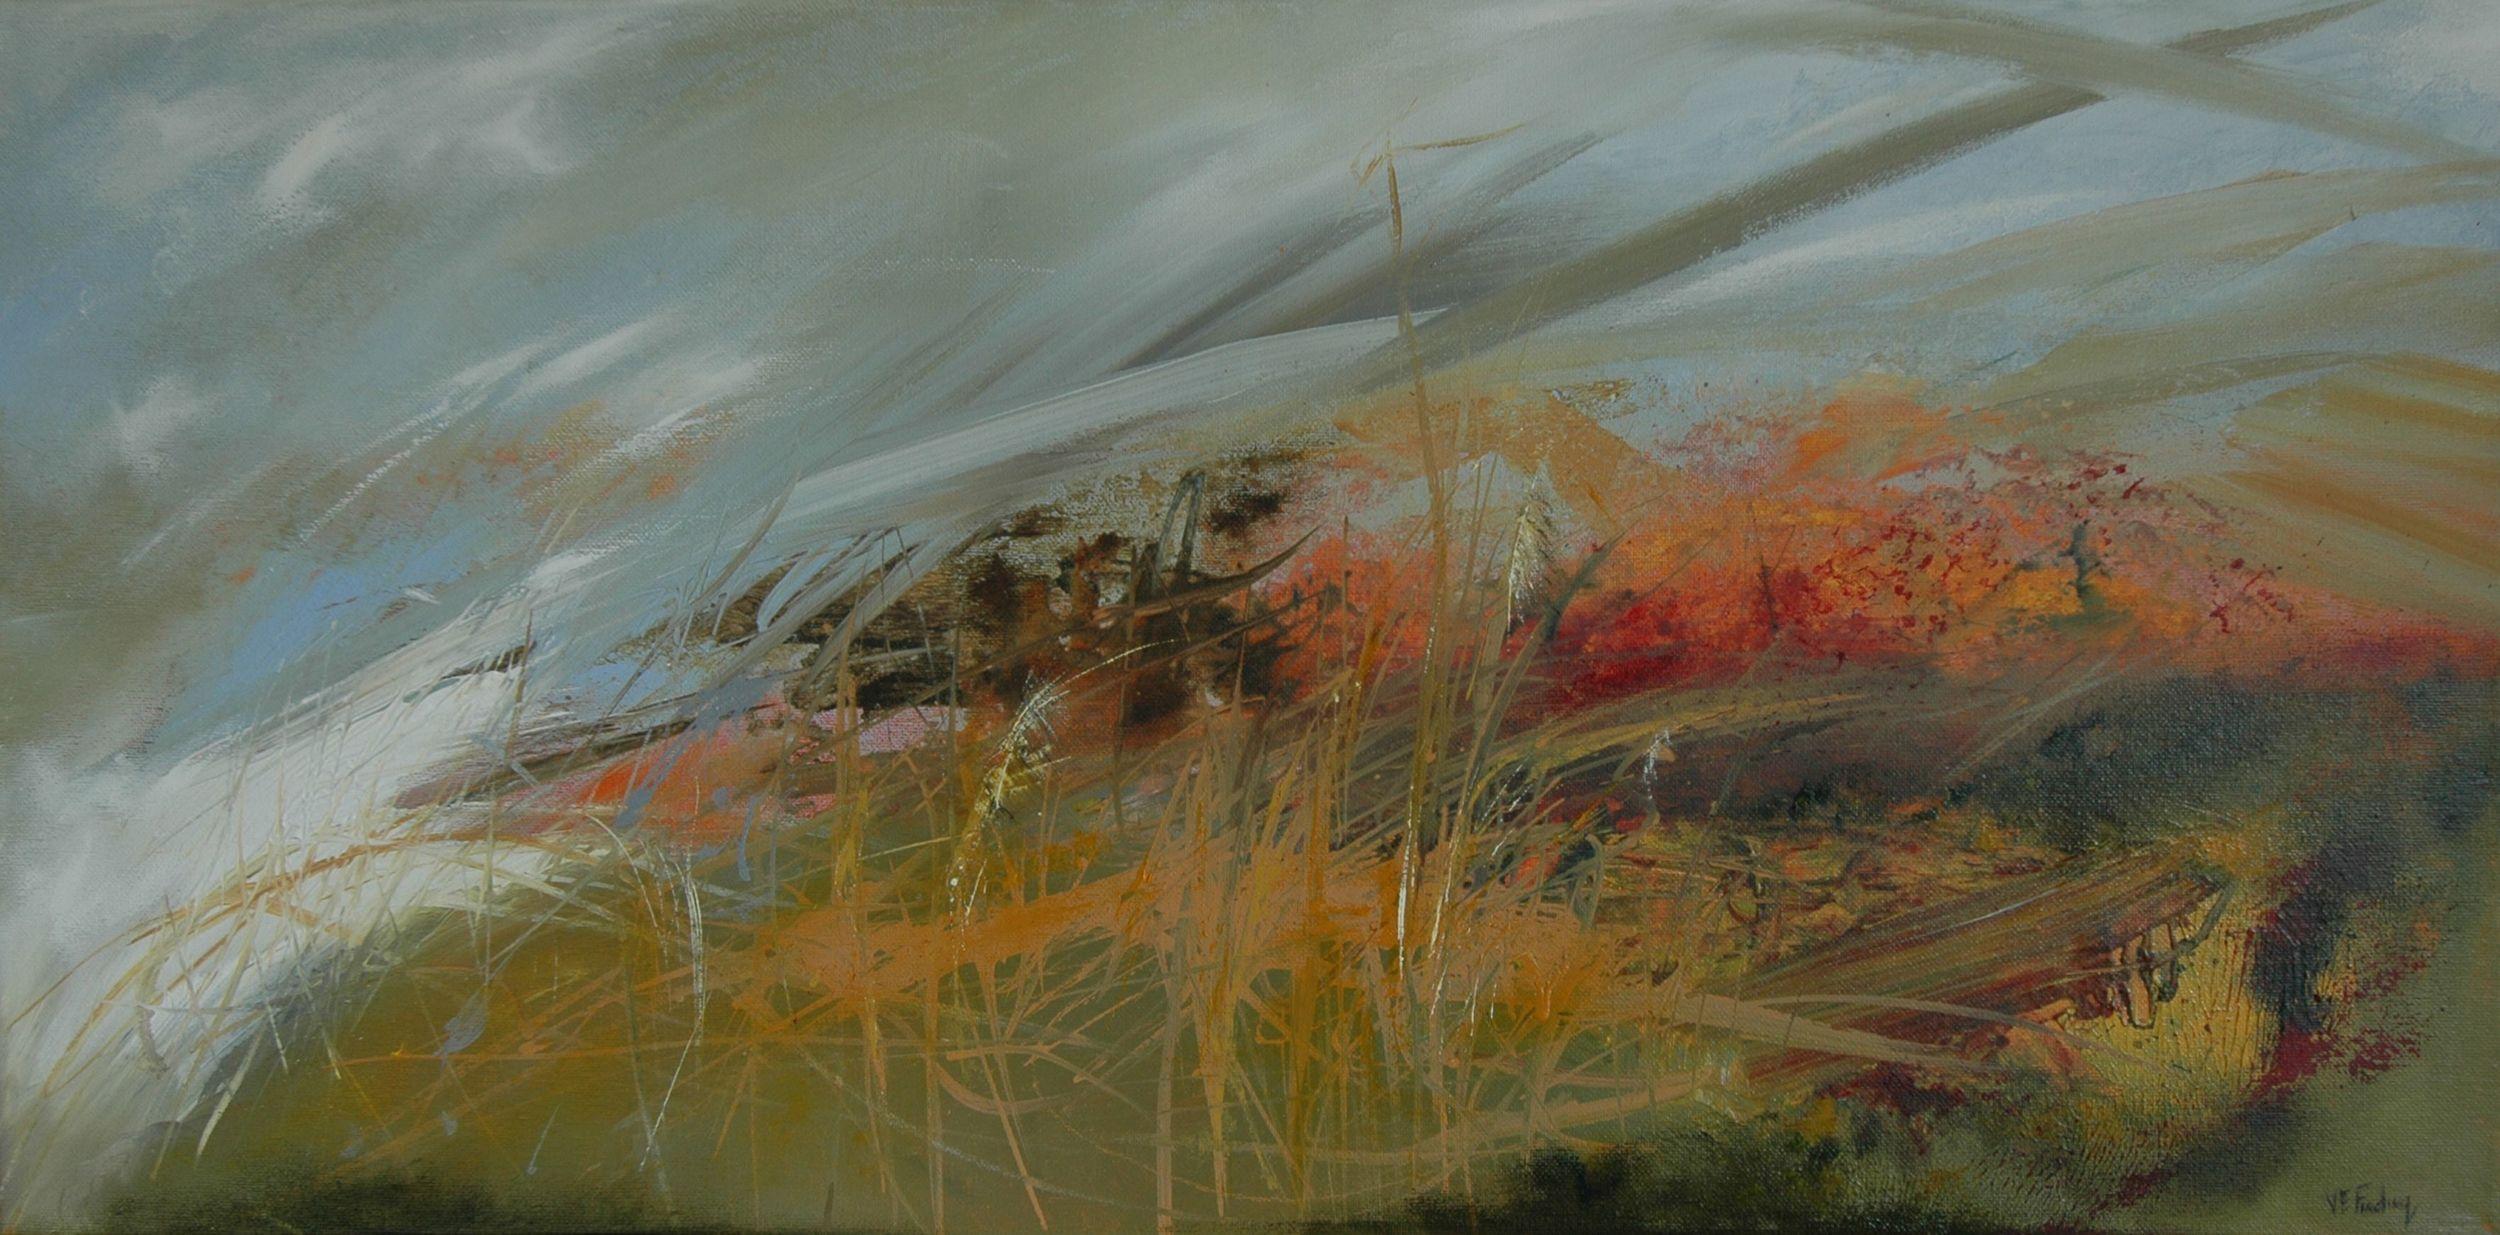 Vicky Finding - Nantucket - oil on canvas - 92cm x 46cm.jpg